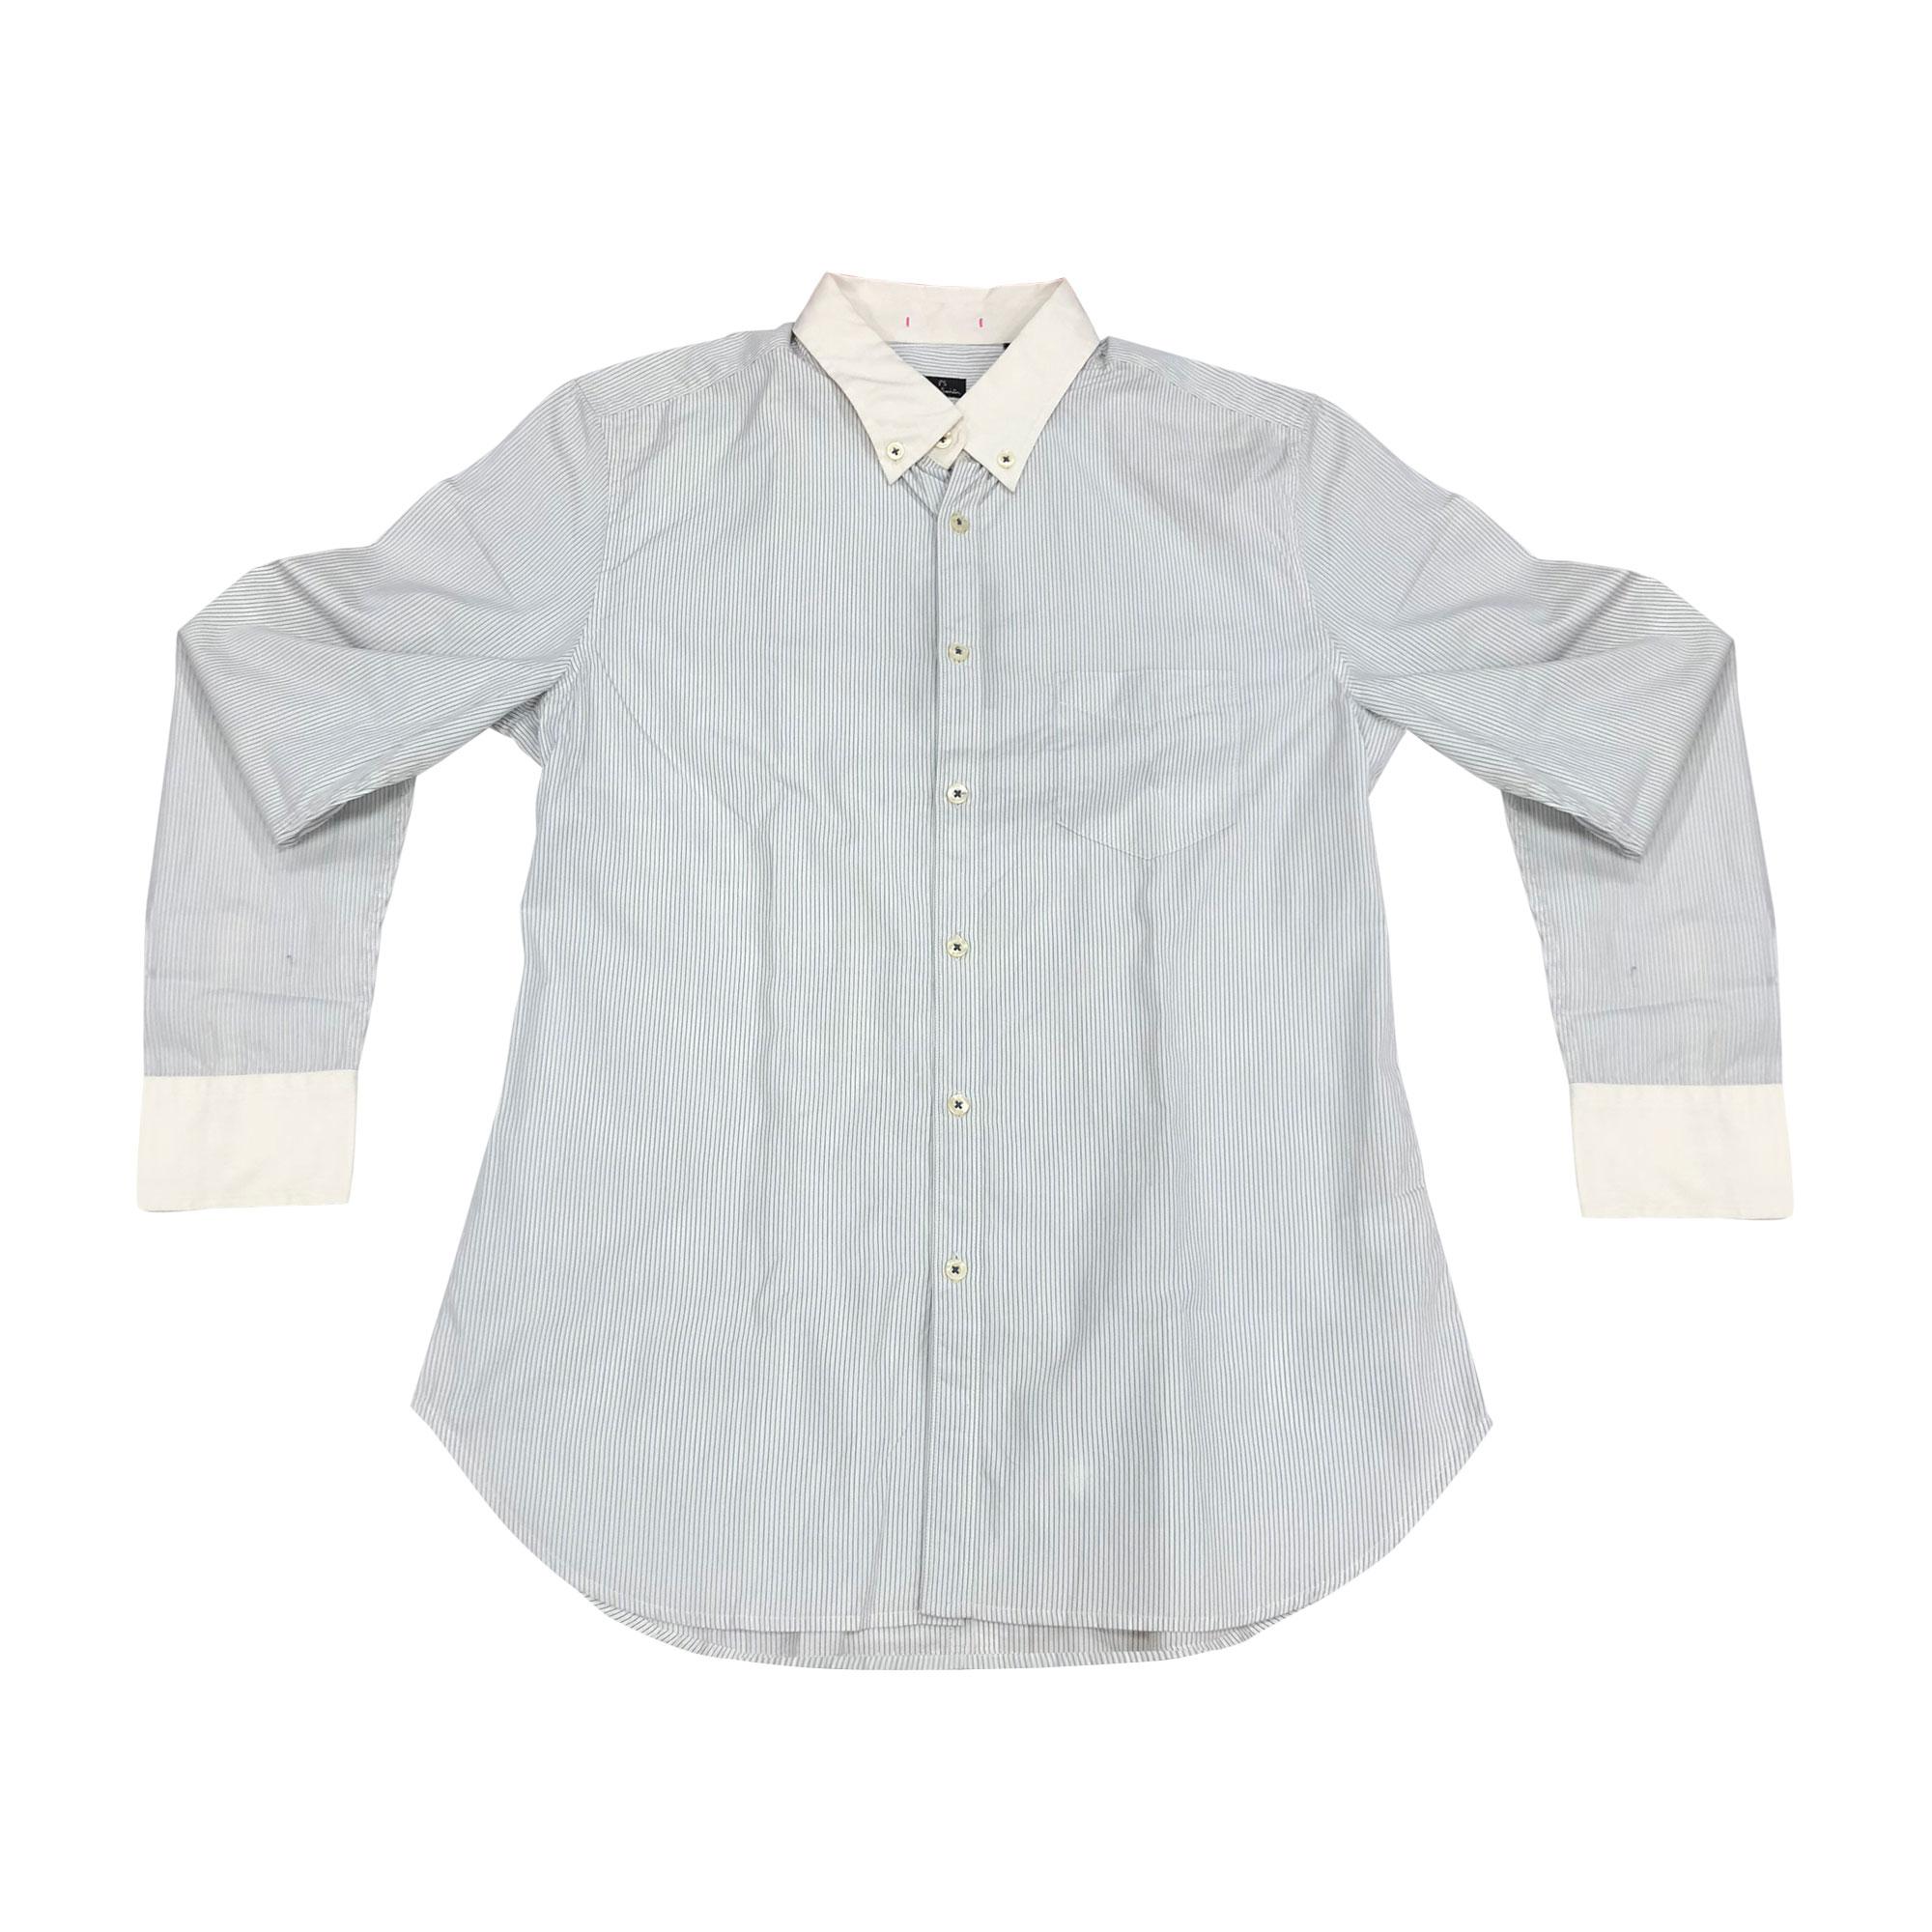 Shirt PAUL SMITH - BLACK LABEL White, off-white, ecru